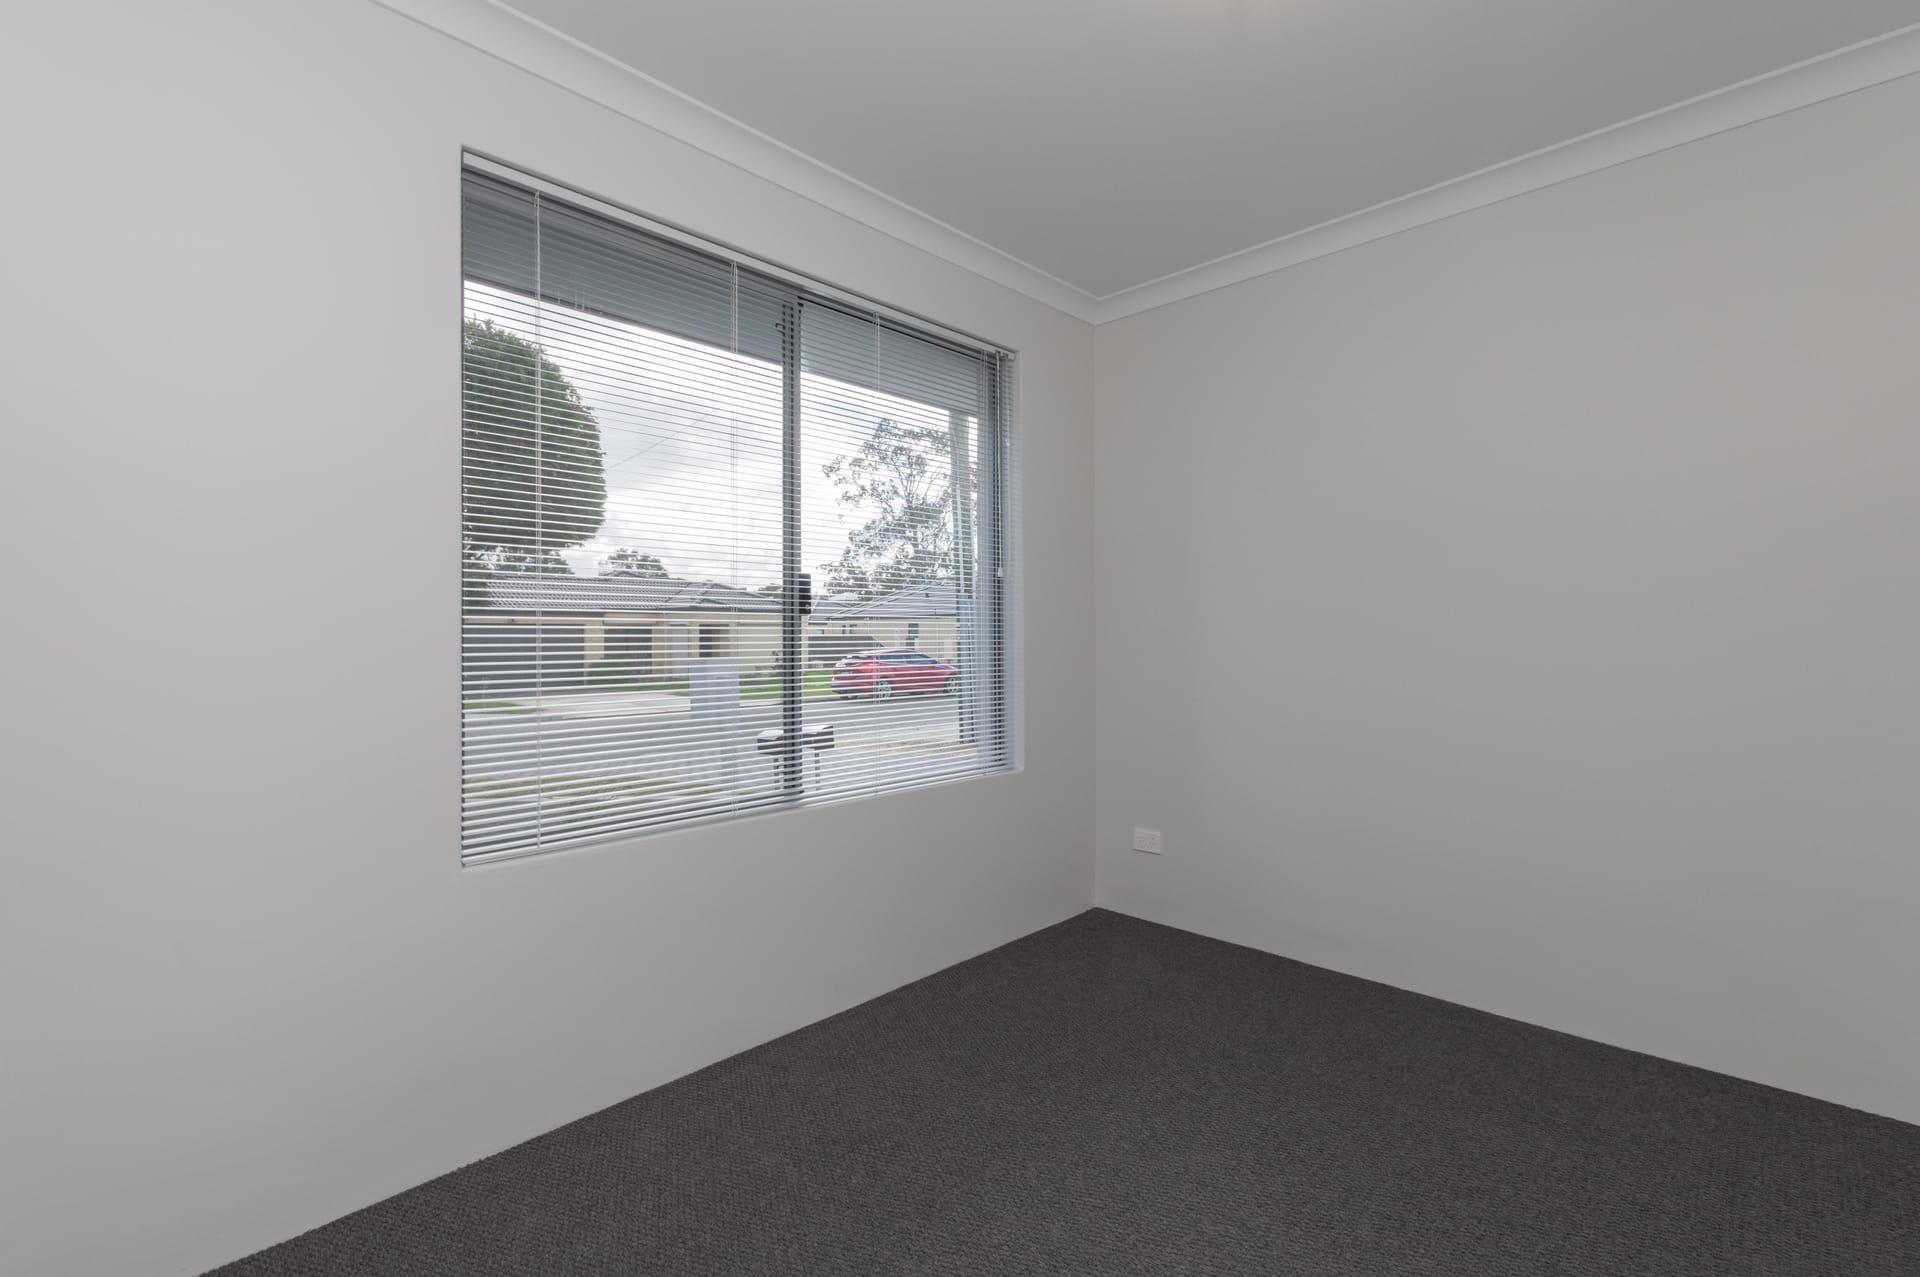 Property 6a Elward Way, BALGA WA 6061 IMAGE